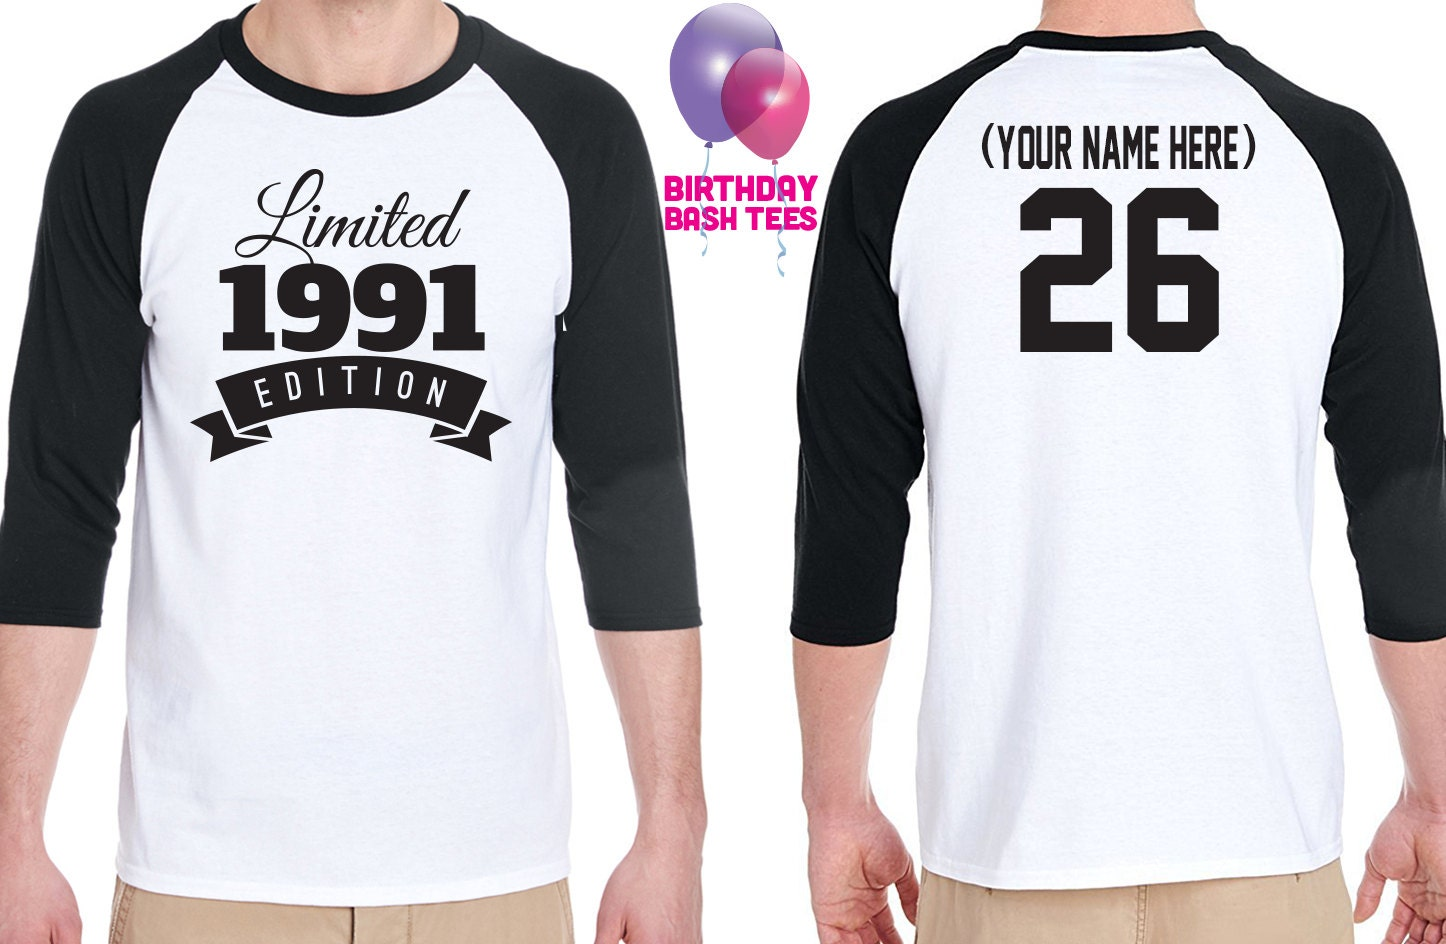 26th Birthday Gift For Men And Women Idea Limited Edition Celebration 26 Year Old Raglan Baseball Tee Shirt 1991